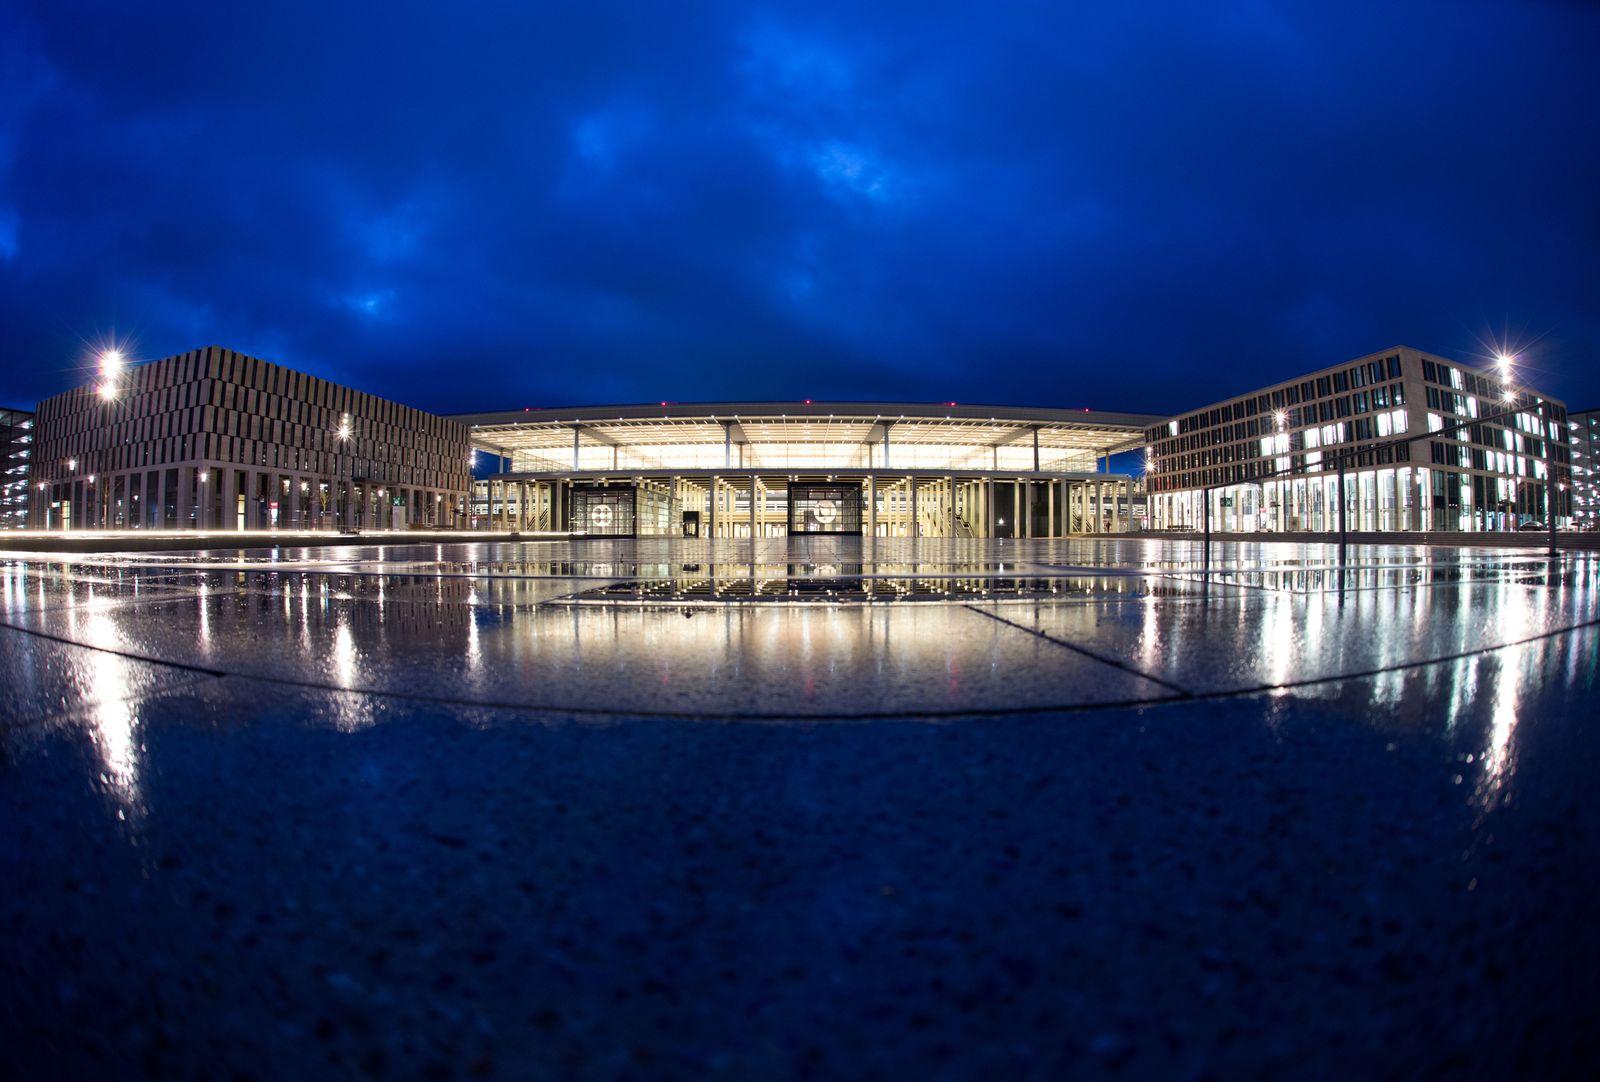 Flughafen Berlin Brandenburg International (BER)